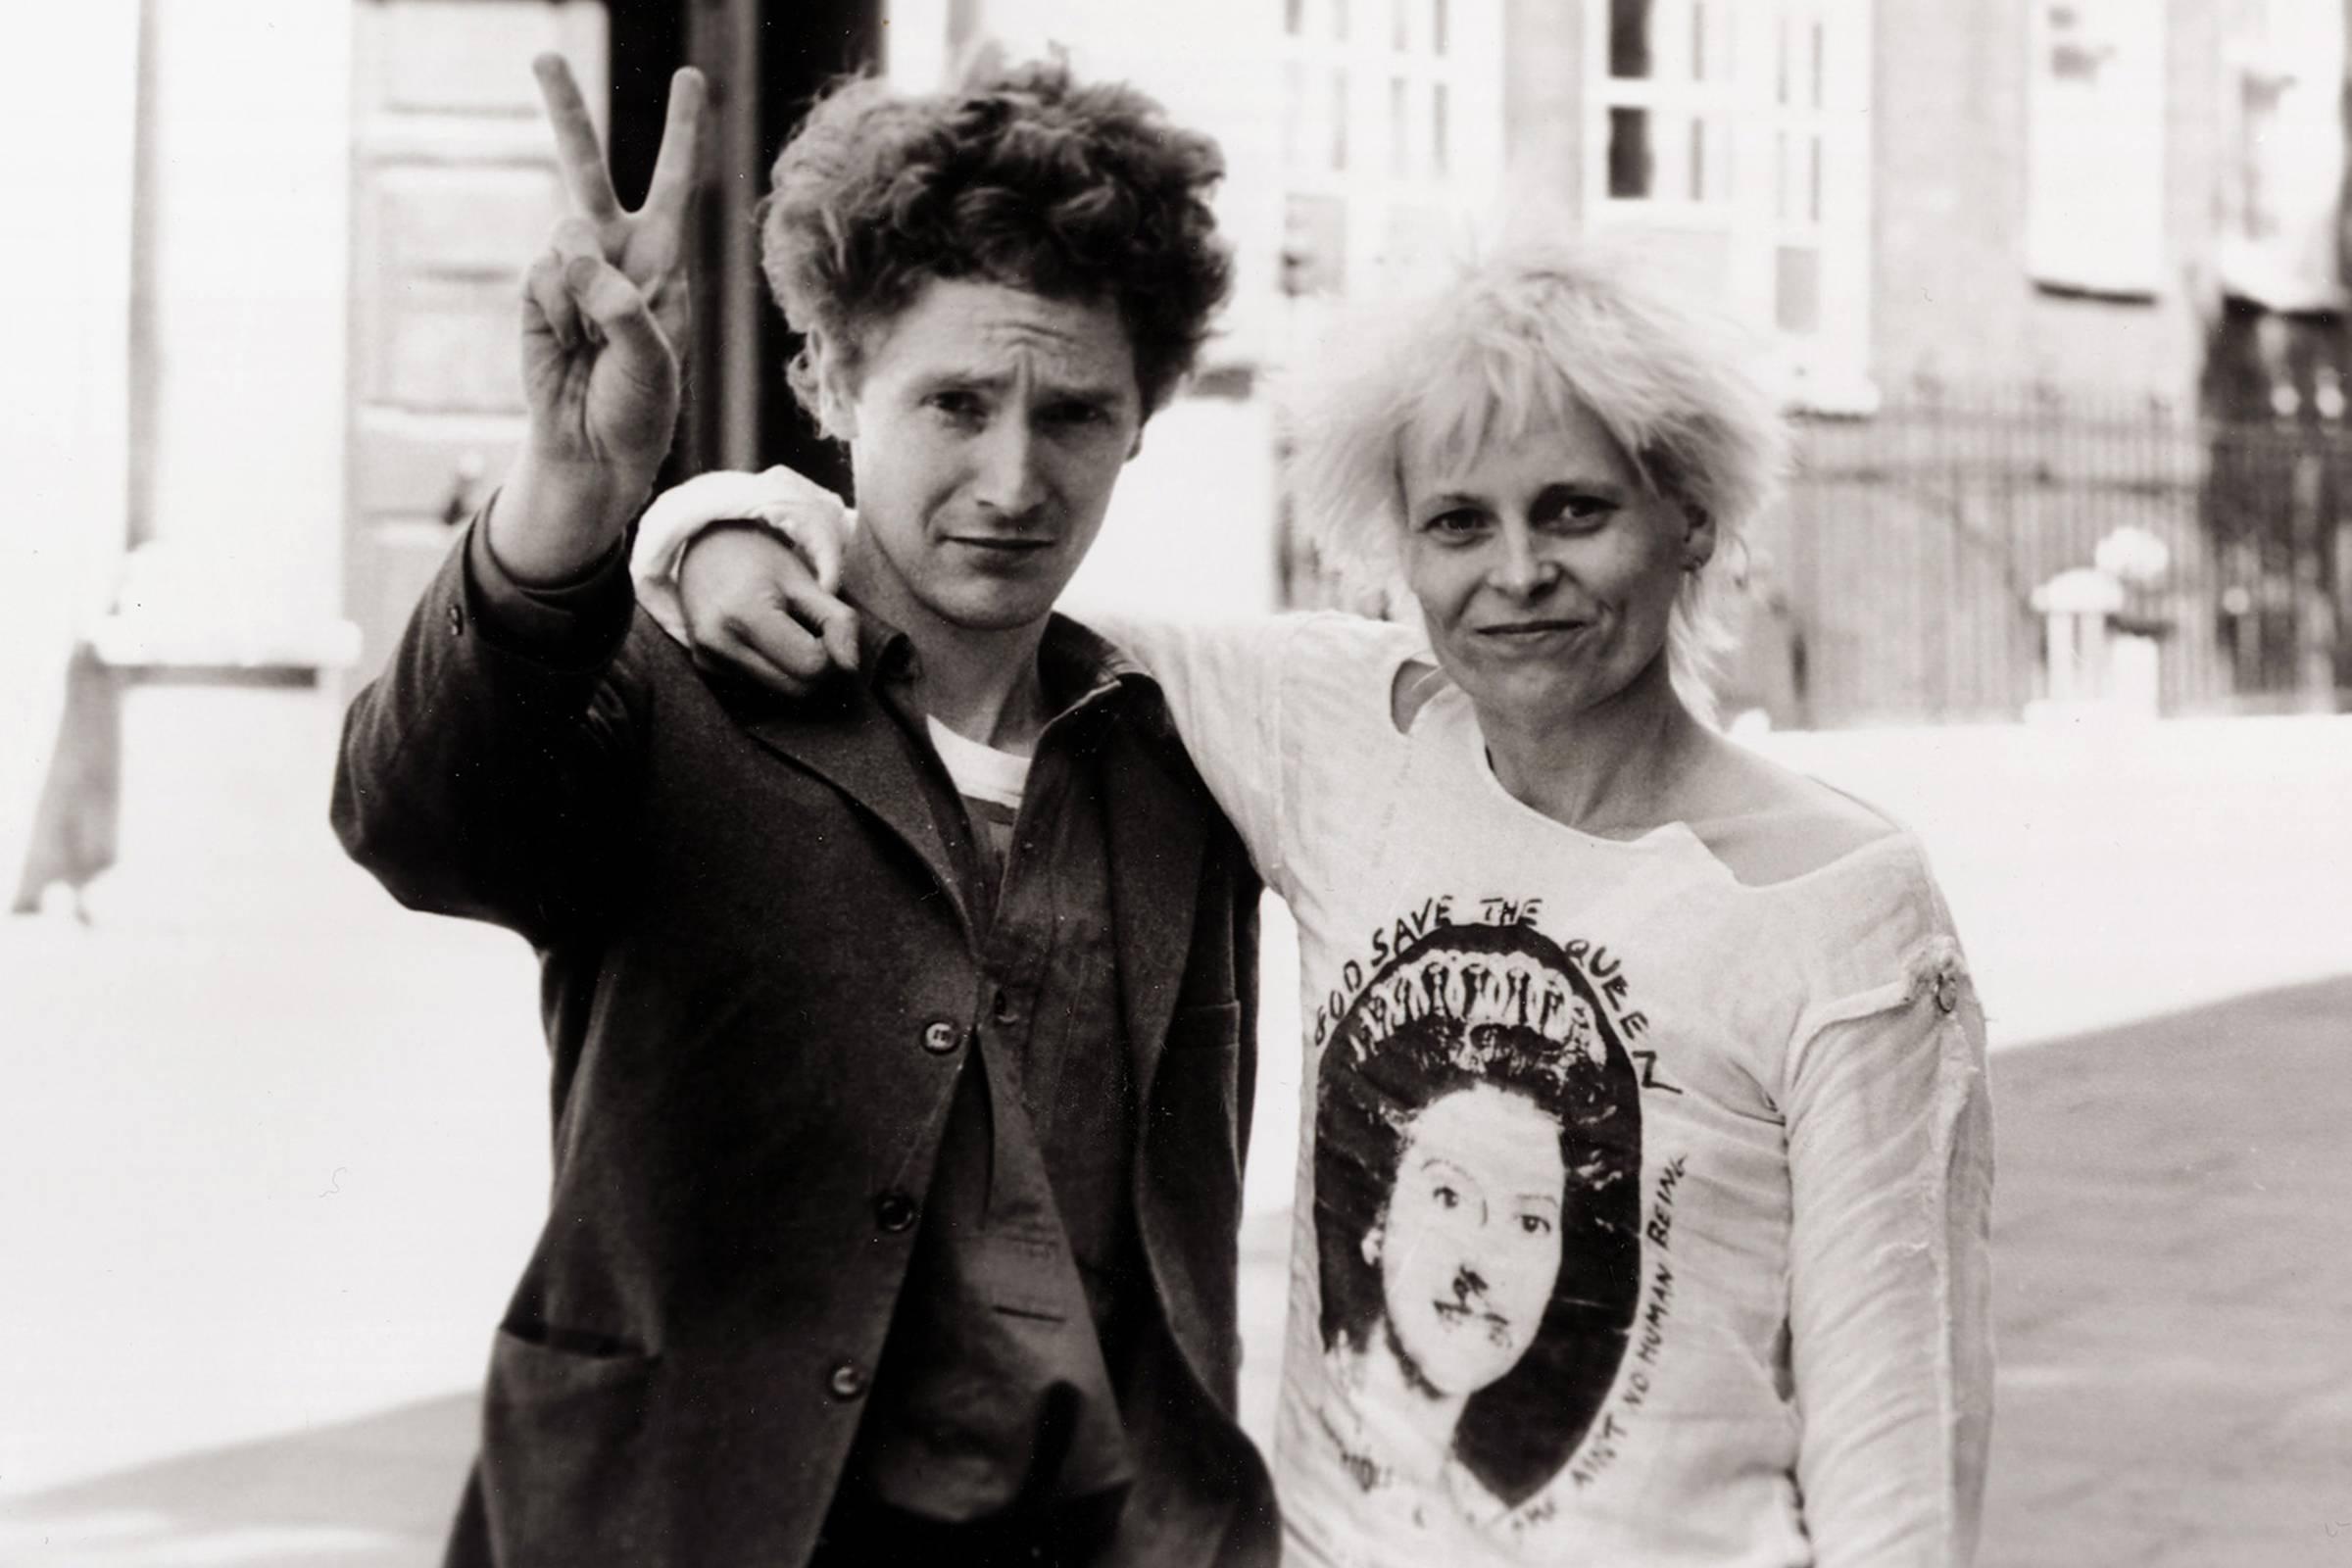 Vivienne Westwood and Malcolm McLaren